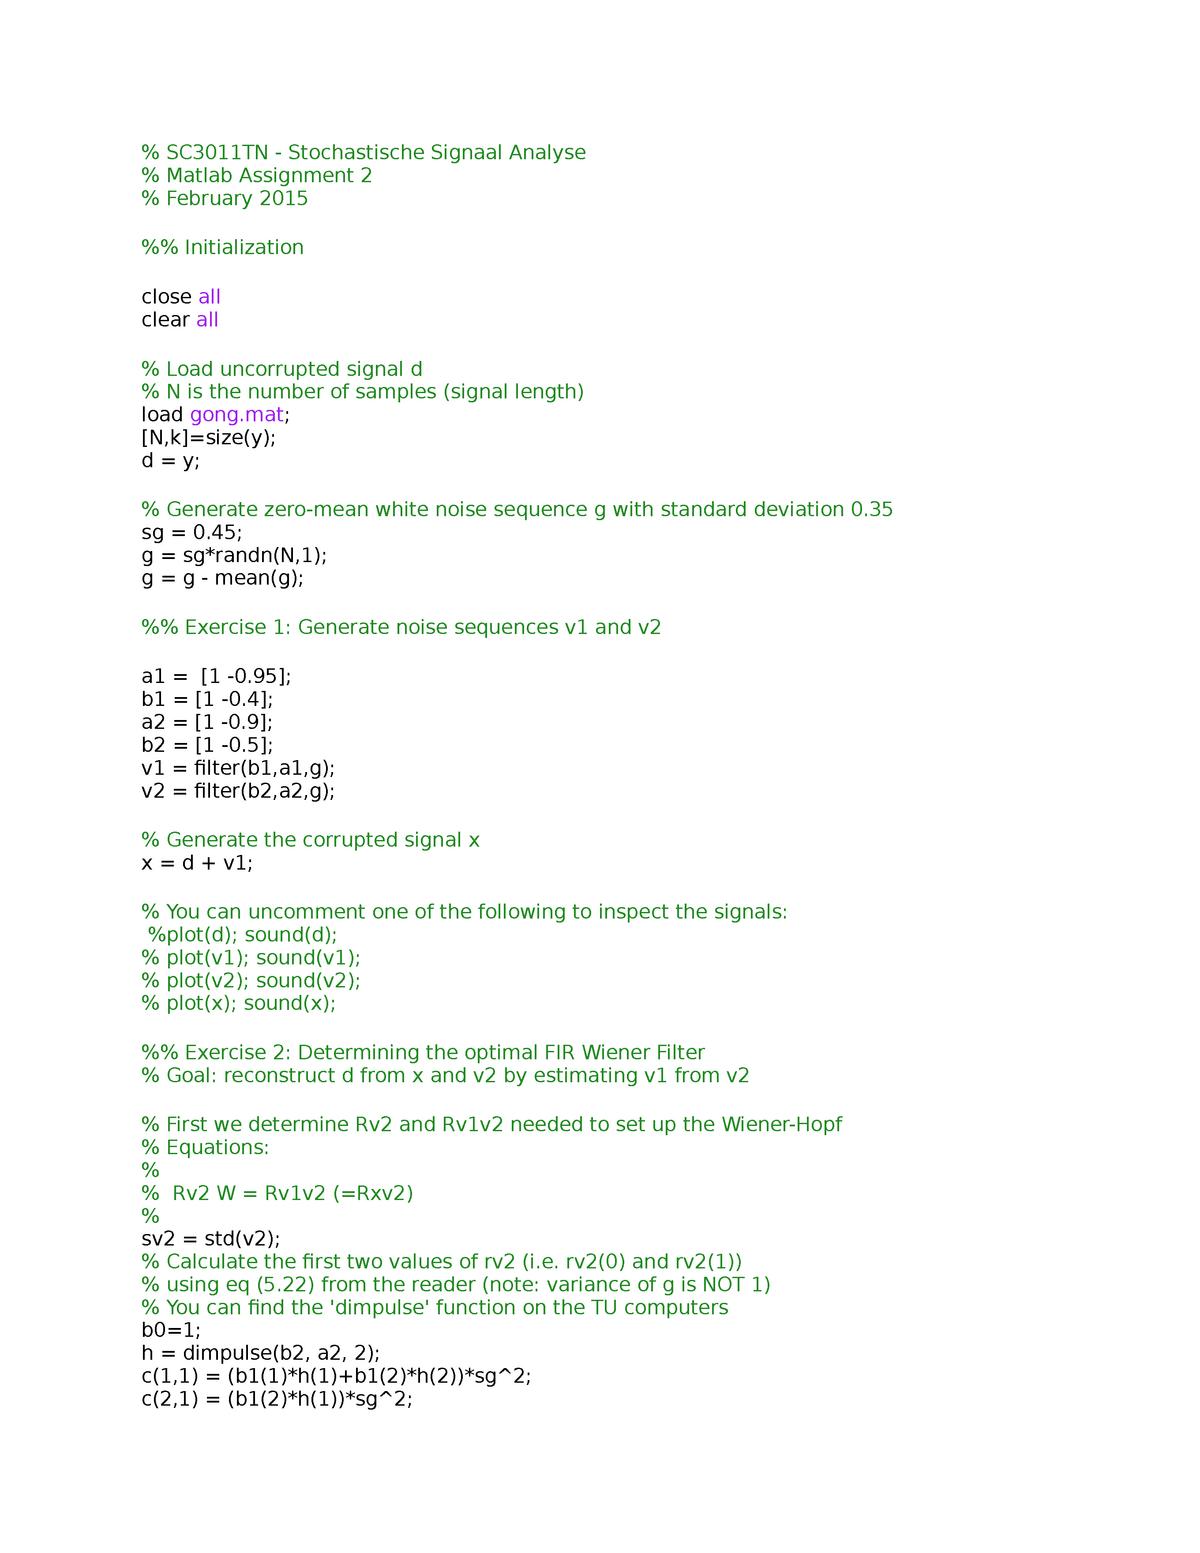 SSA Matlab 2 - SC3011TN: Stochastic Signal Analysis